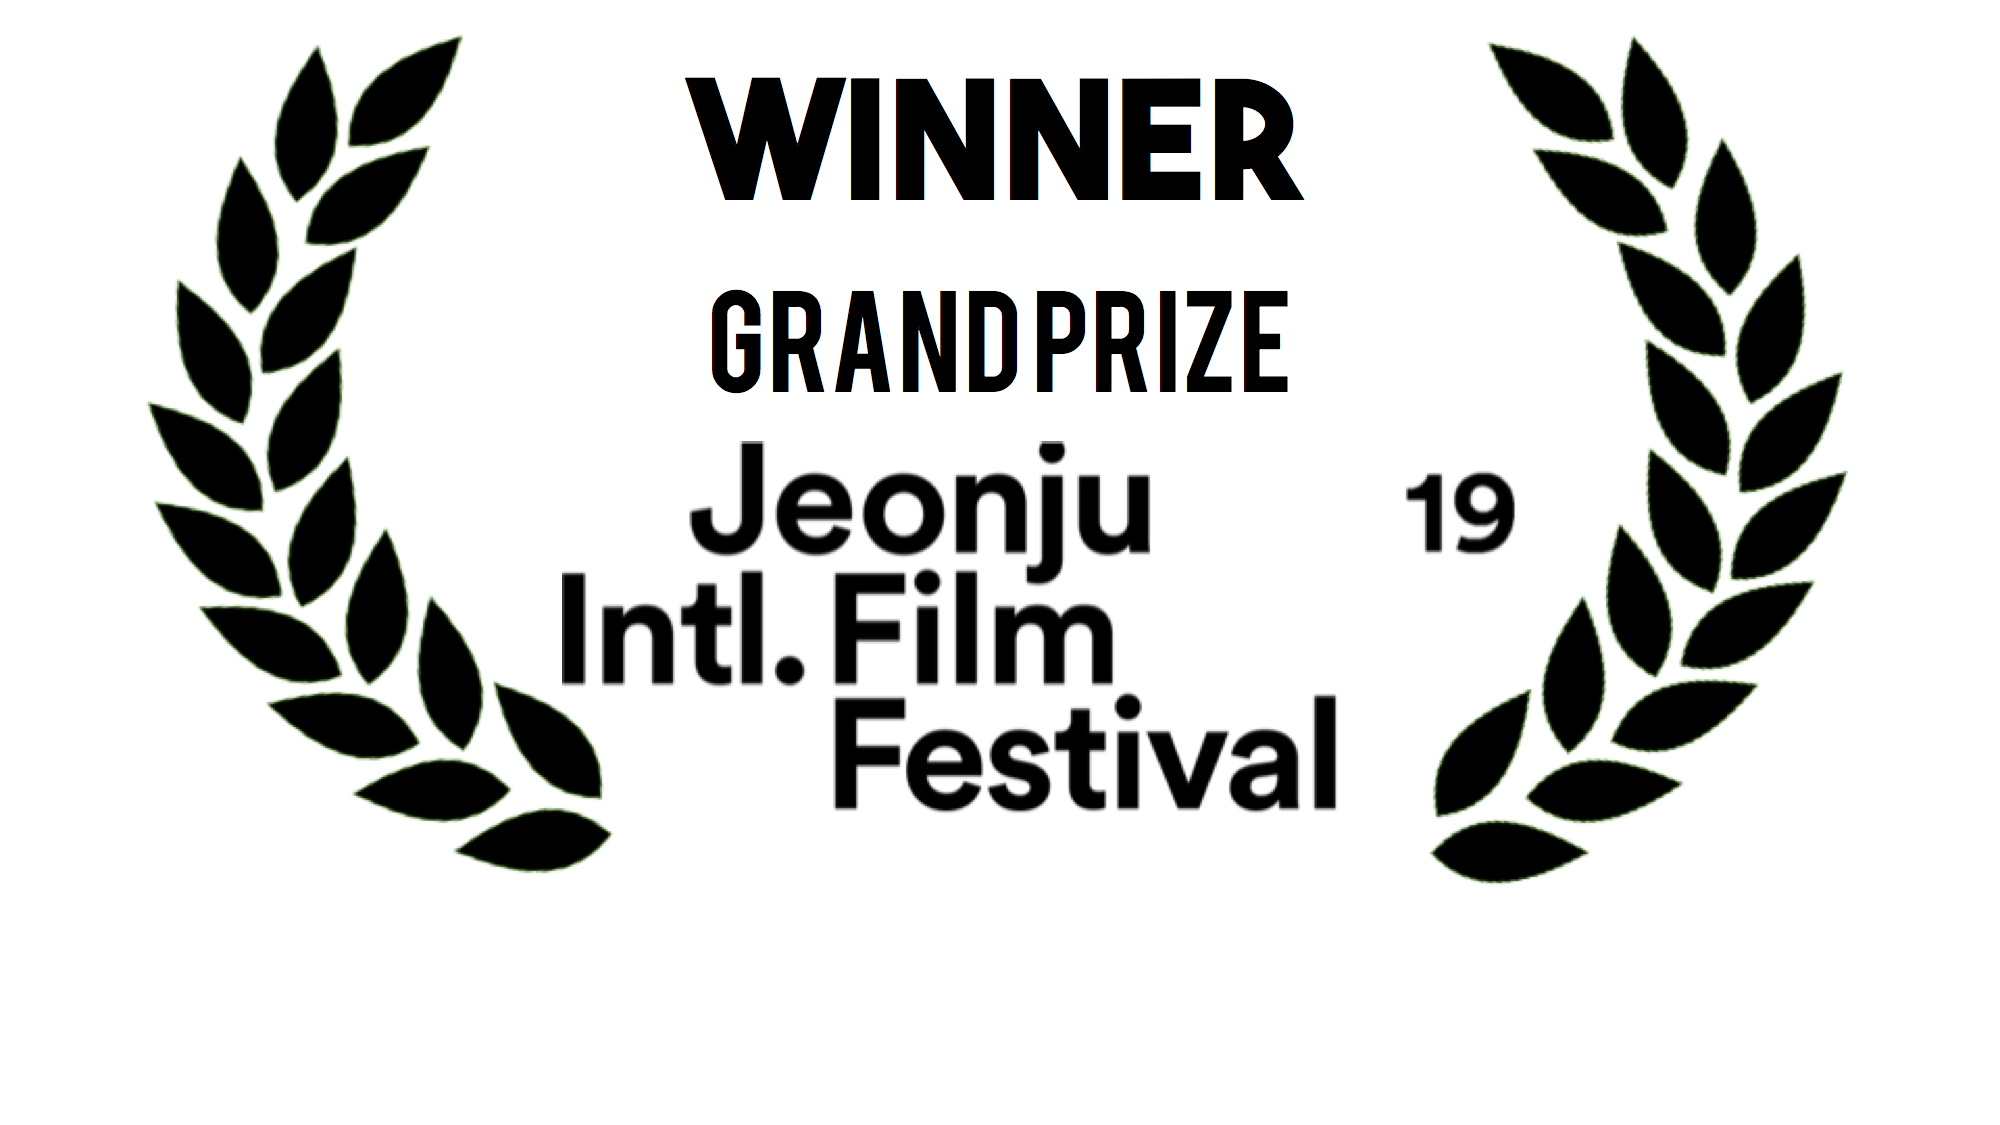 LAS H - JEONJu - Grand Prize.png